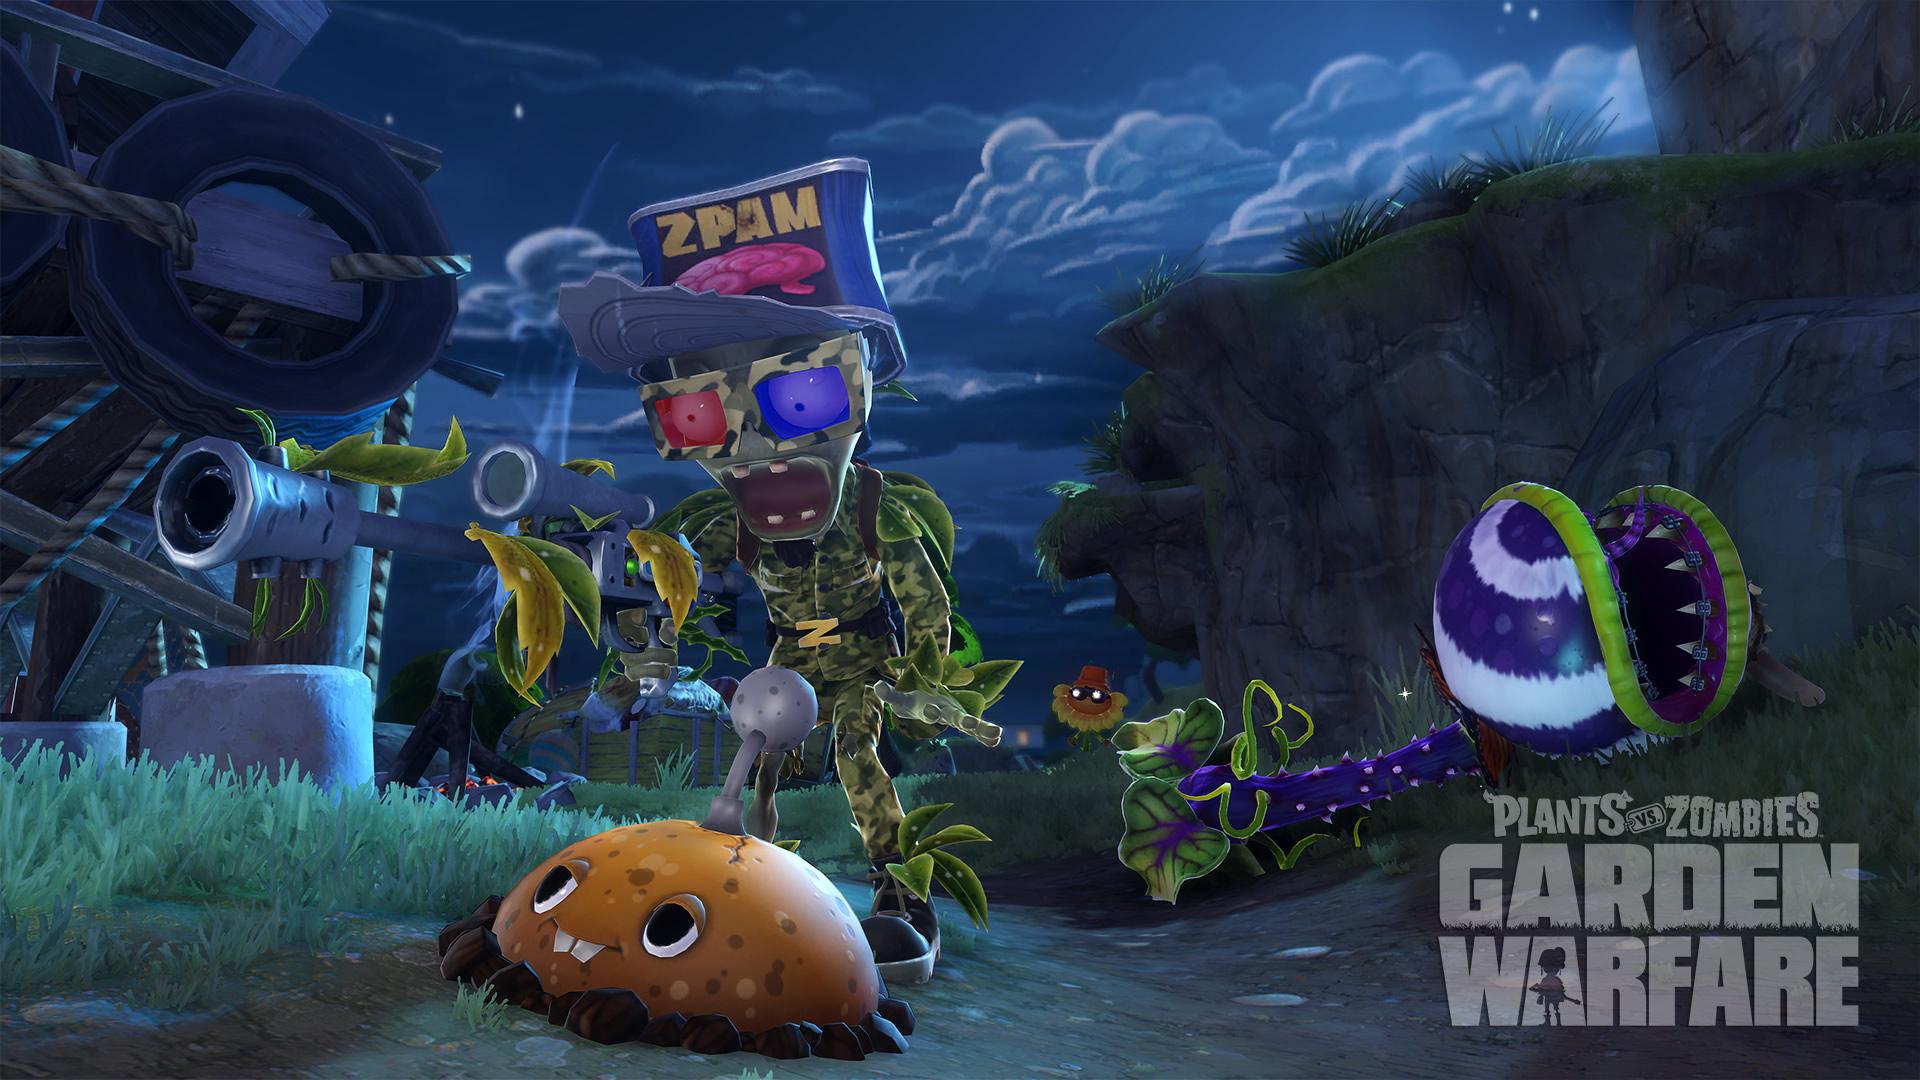 Pvz garden warfare review jatokun reviews de playstation 4 y pc for Plants versus zombies garden warfare